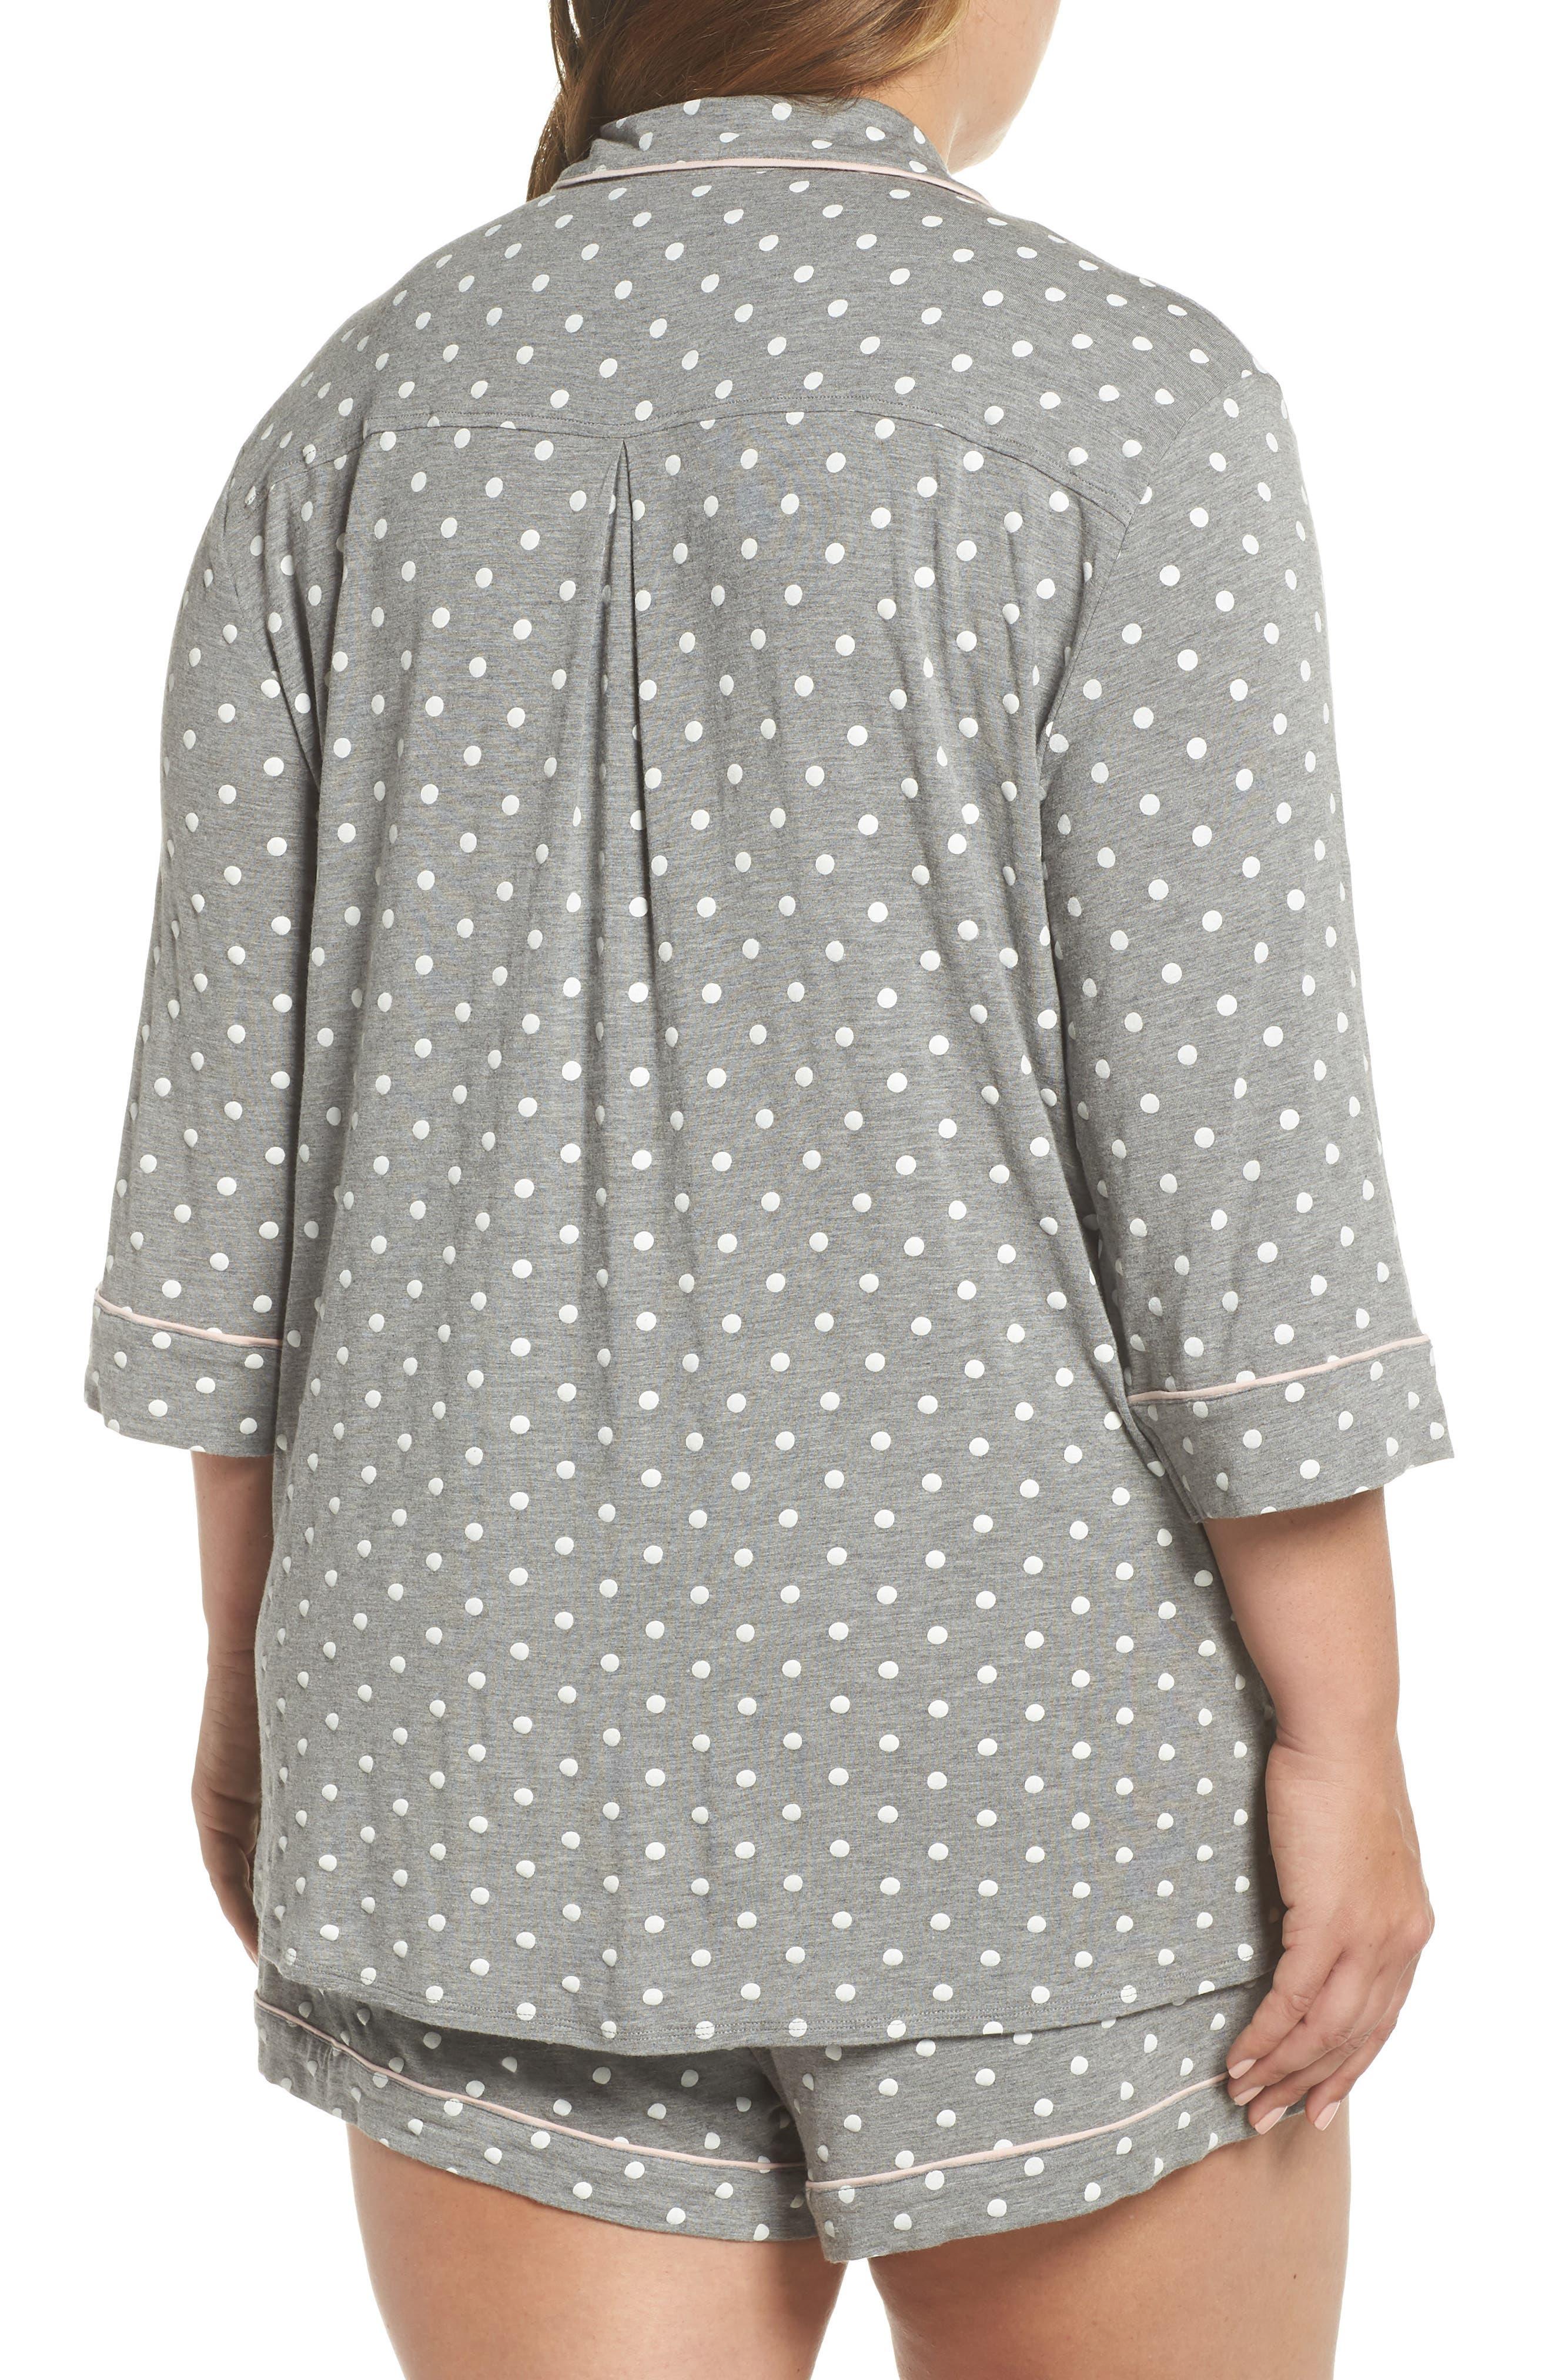 Modal Three-Quarter Sleeve Short Pajamas,                             Alternate thumbnail 2, color,                             027